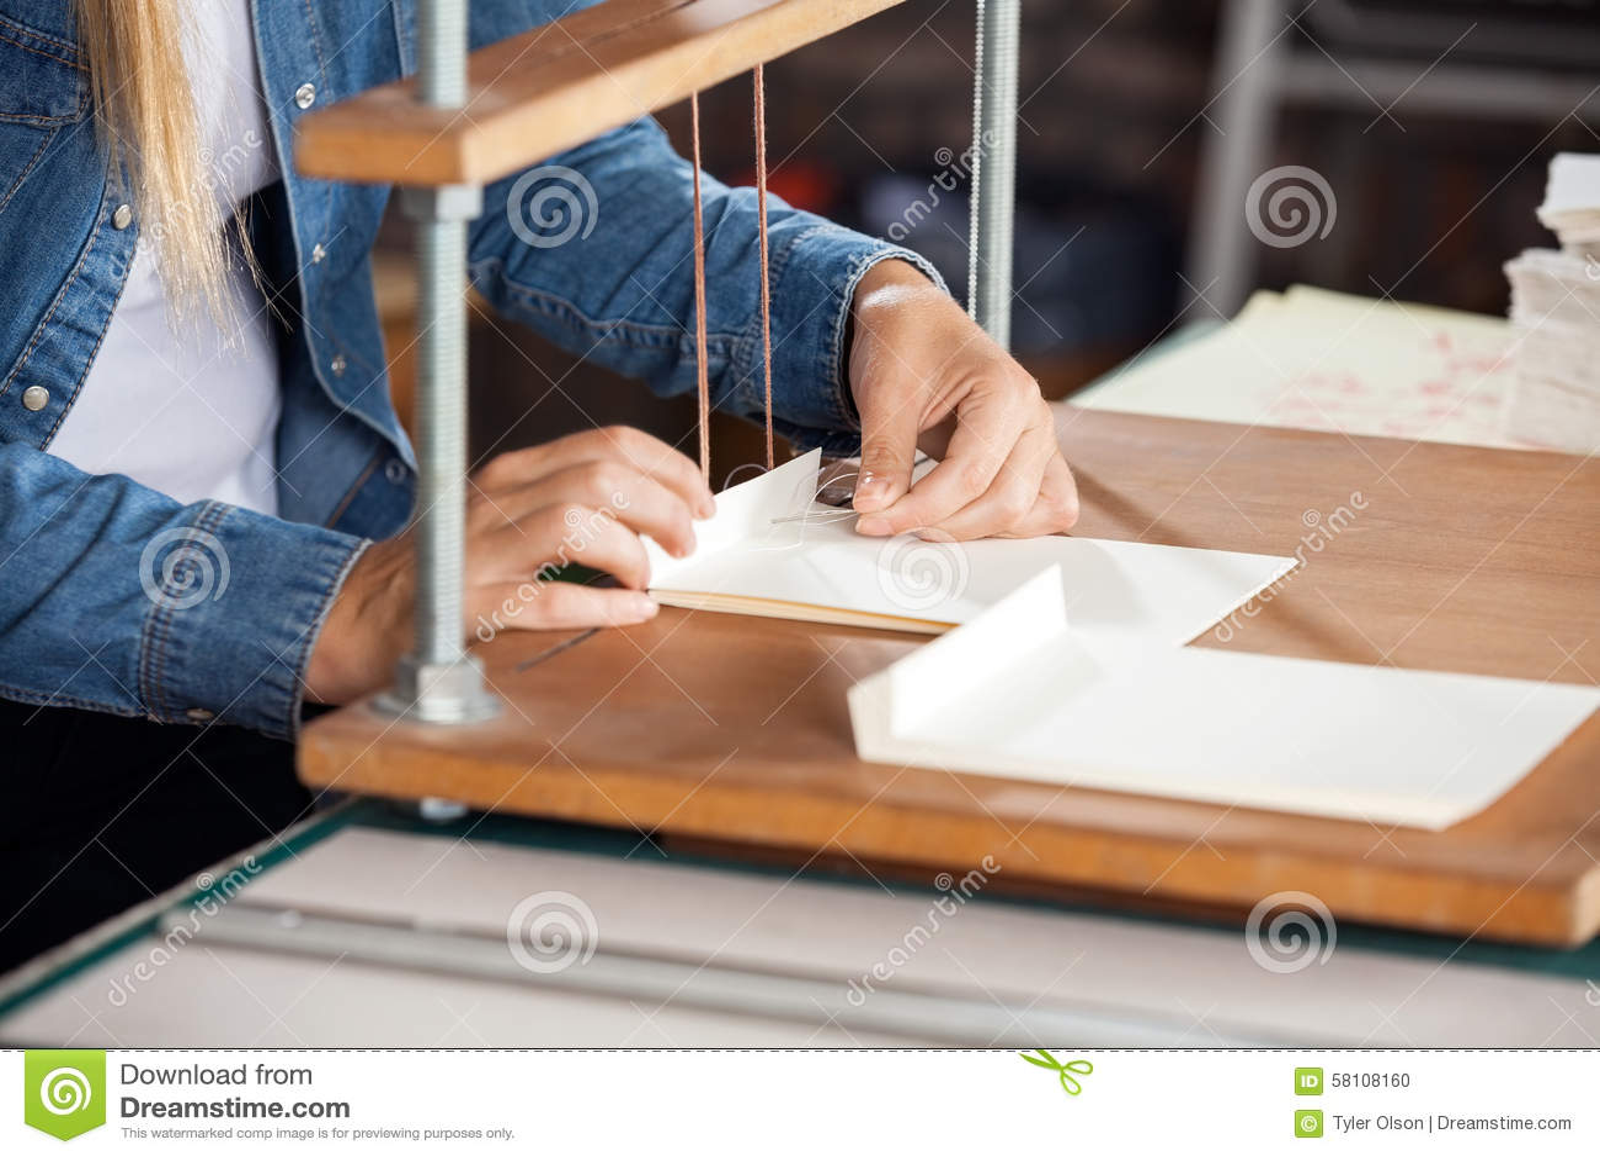 sweatshop essays